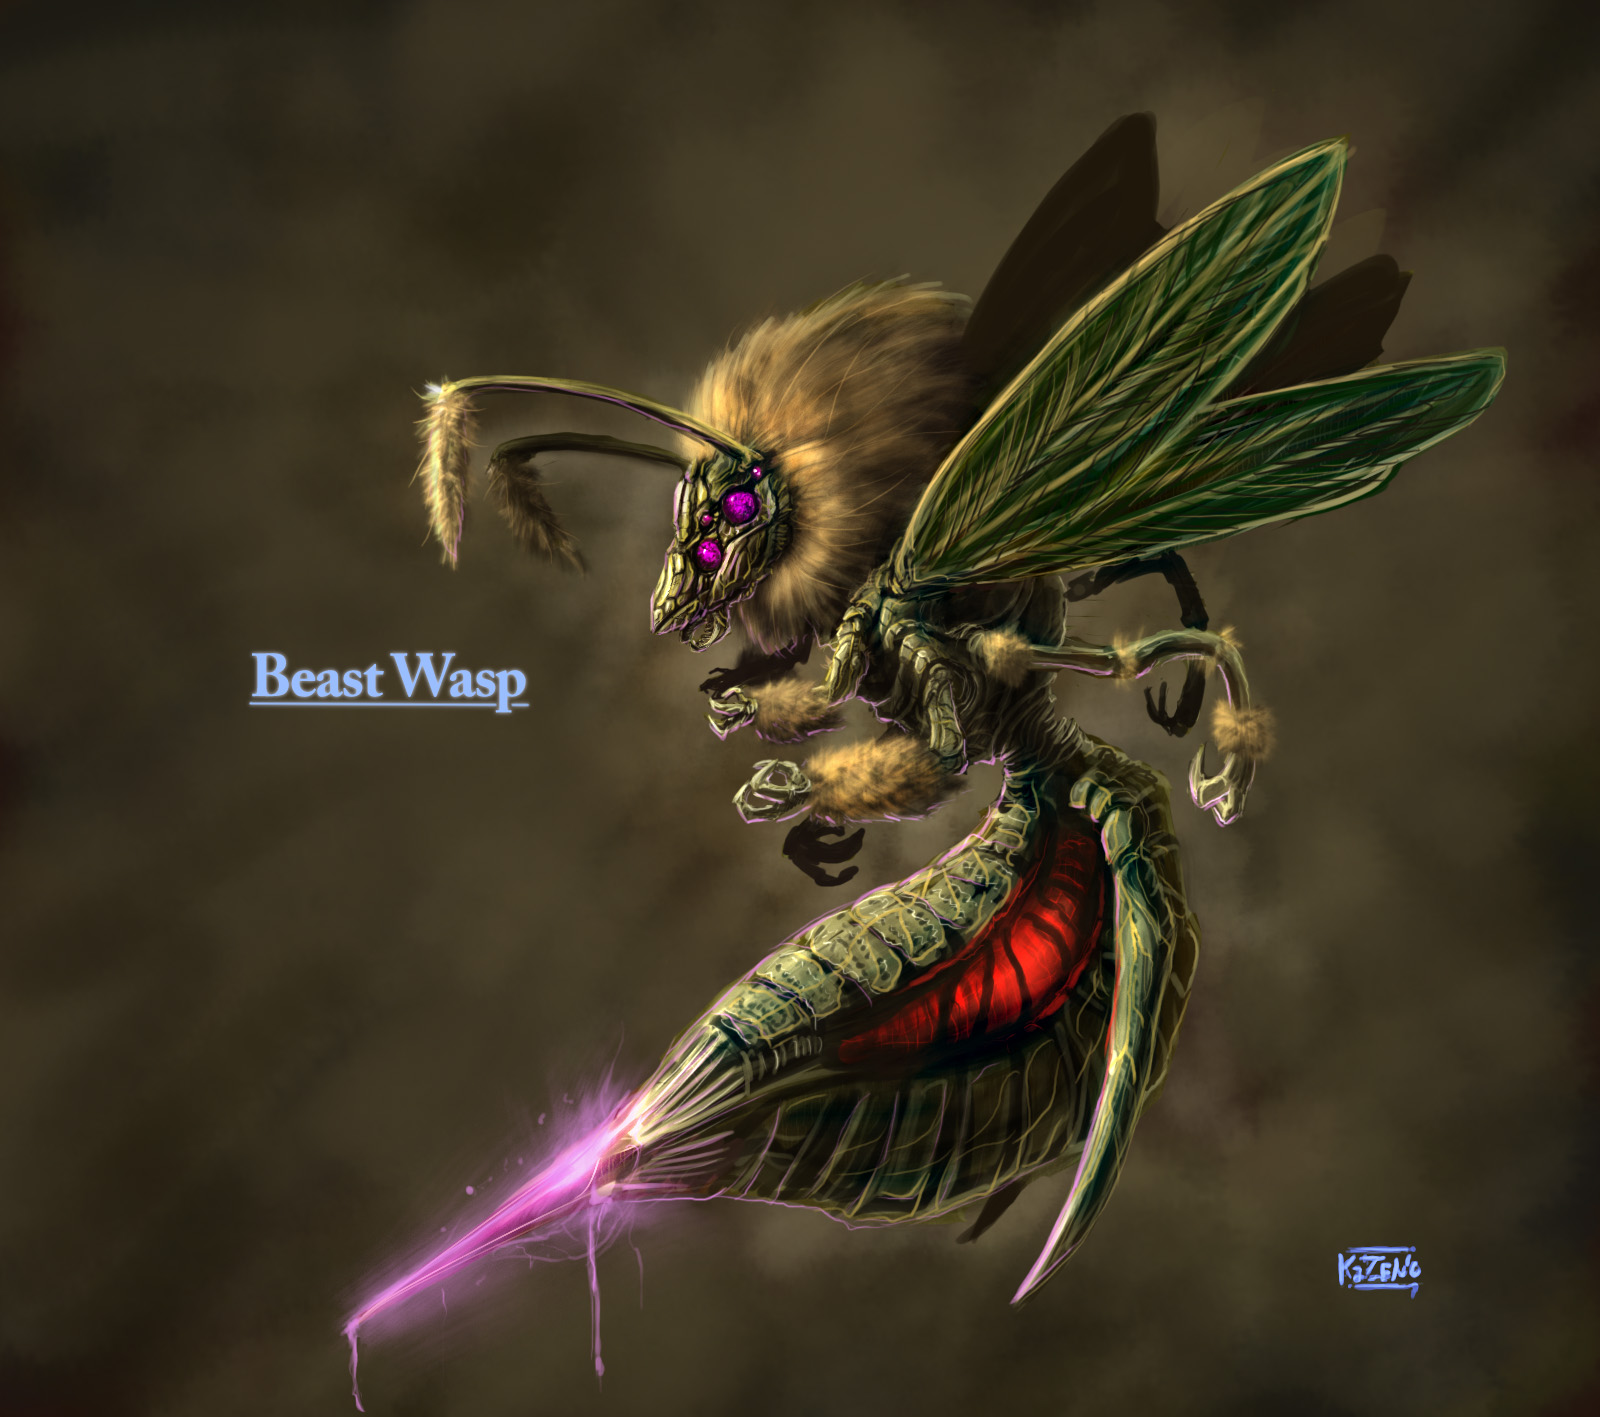 Beast Wasp by PenName-Kazeno on DeviantArt